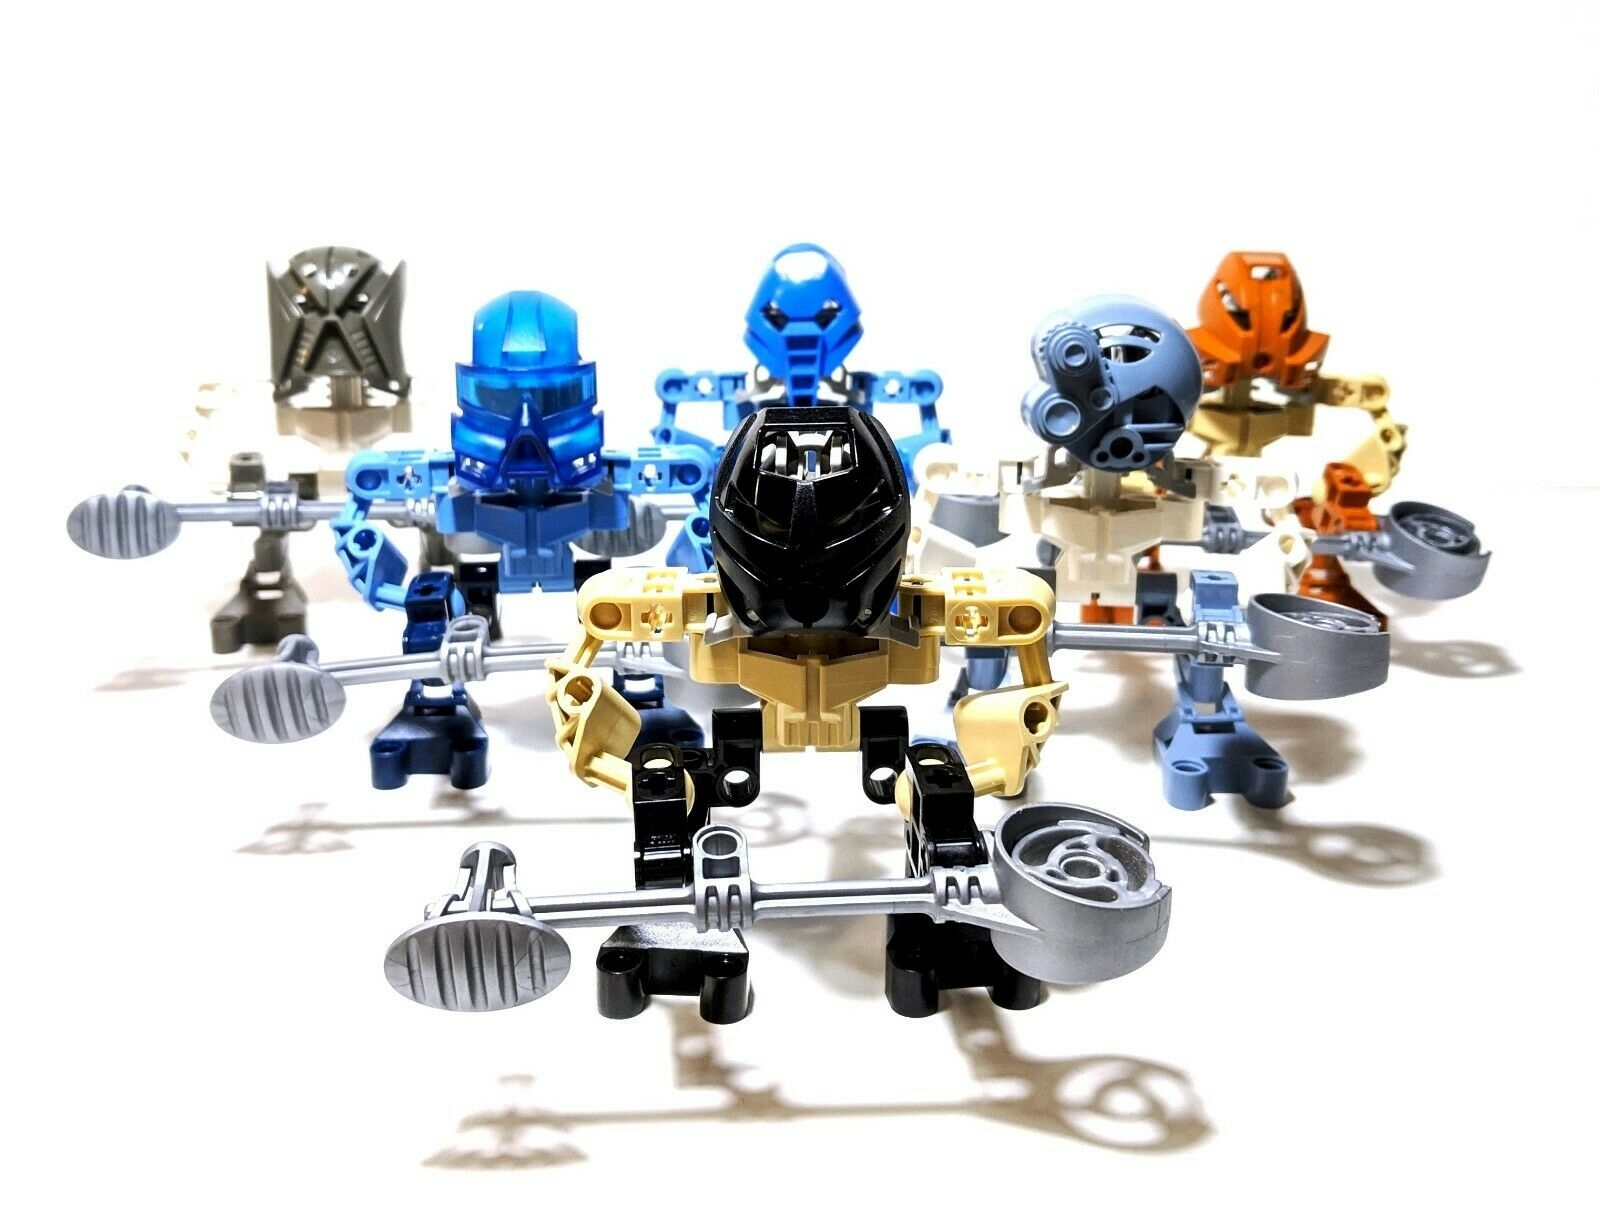 LEGO Bionicle Mata Nui Matoran Complete Set of 6  8581 8582 8583 8584 8585 8586